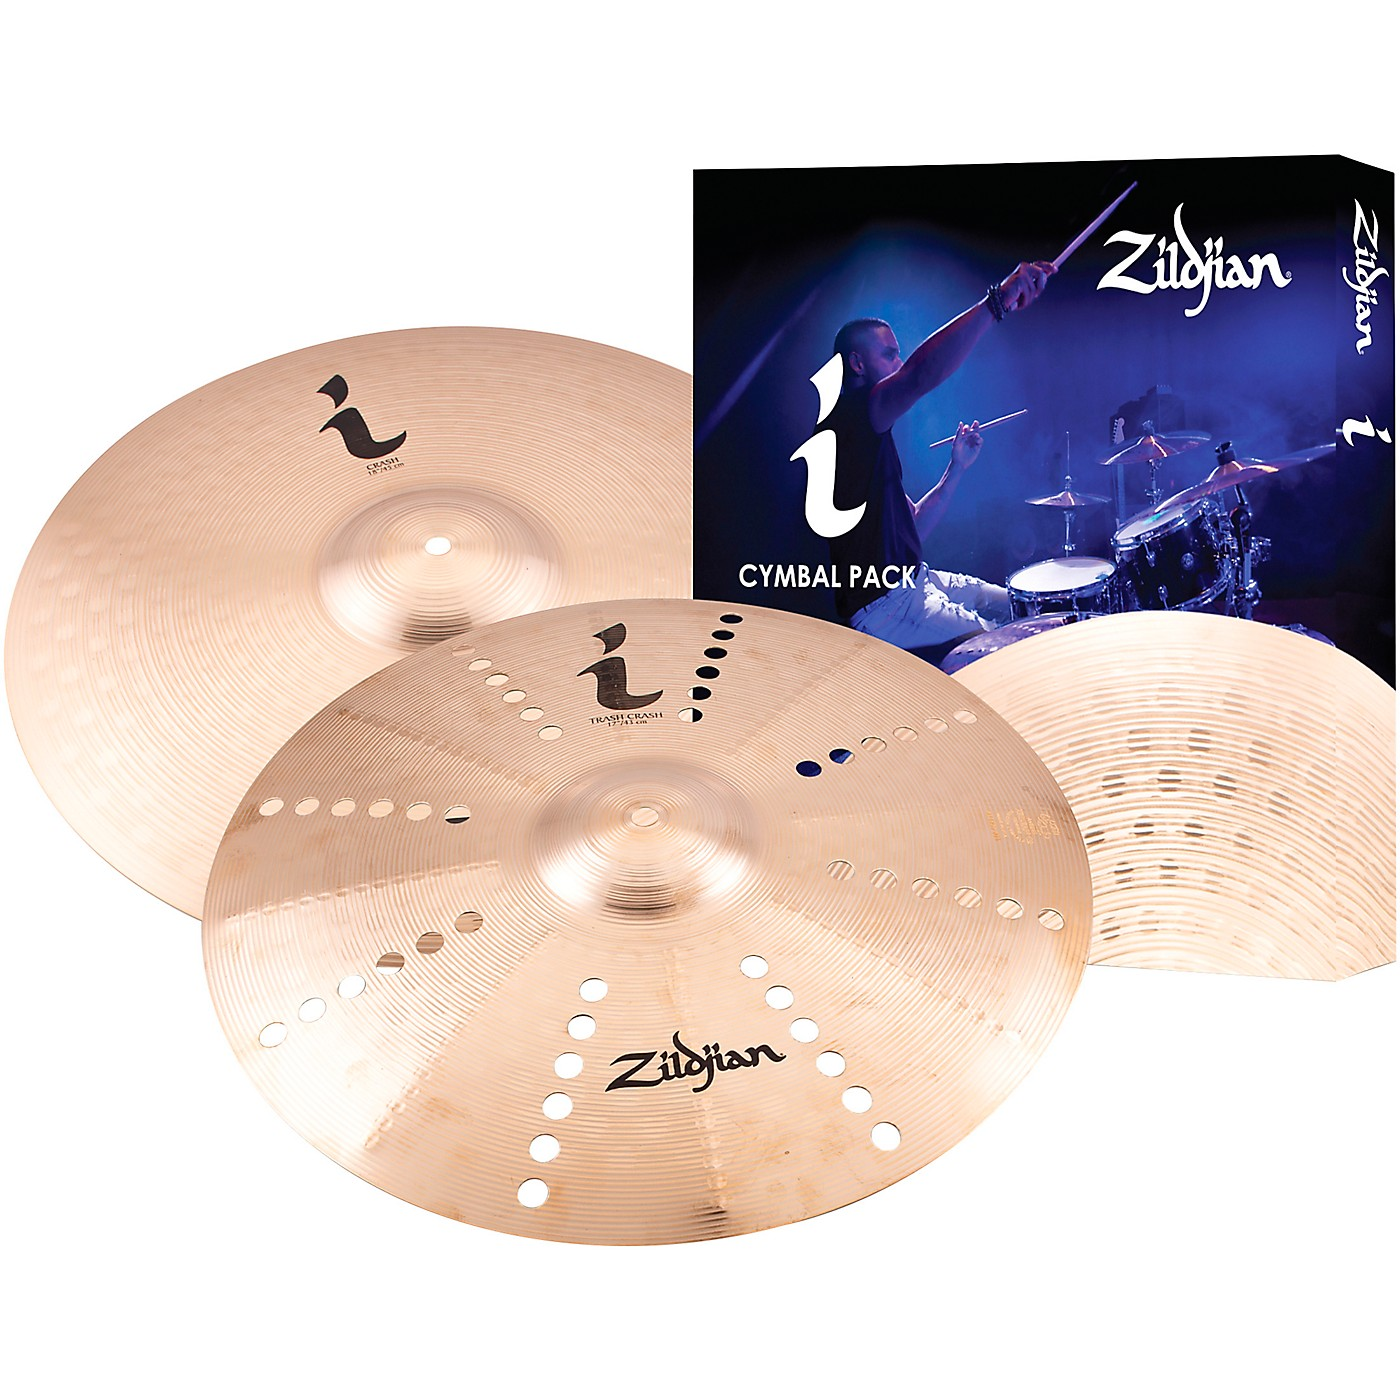 Zildjian I Series Expression Cymbal Pack 2 thumbnail